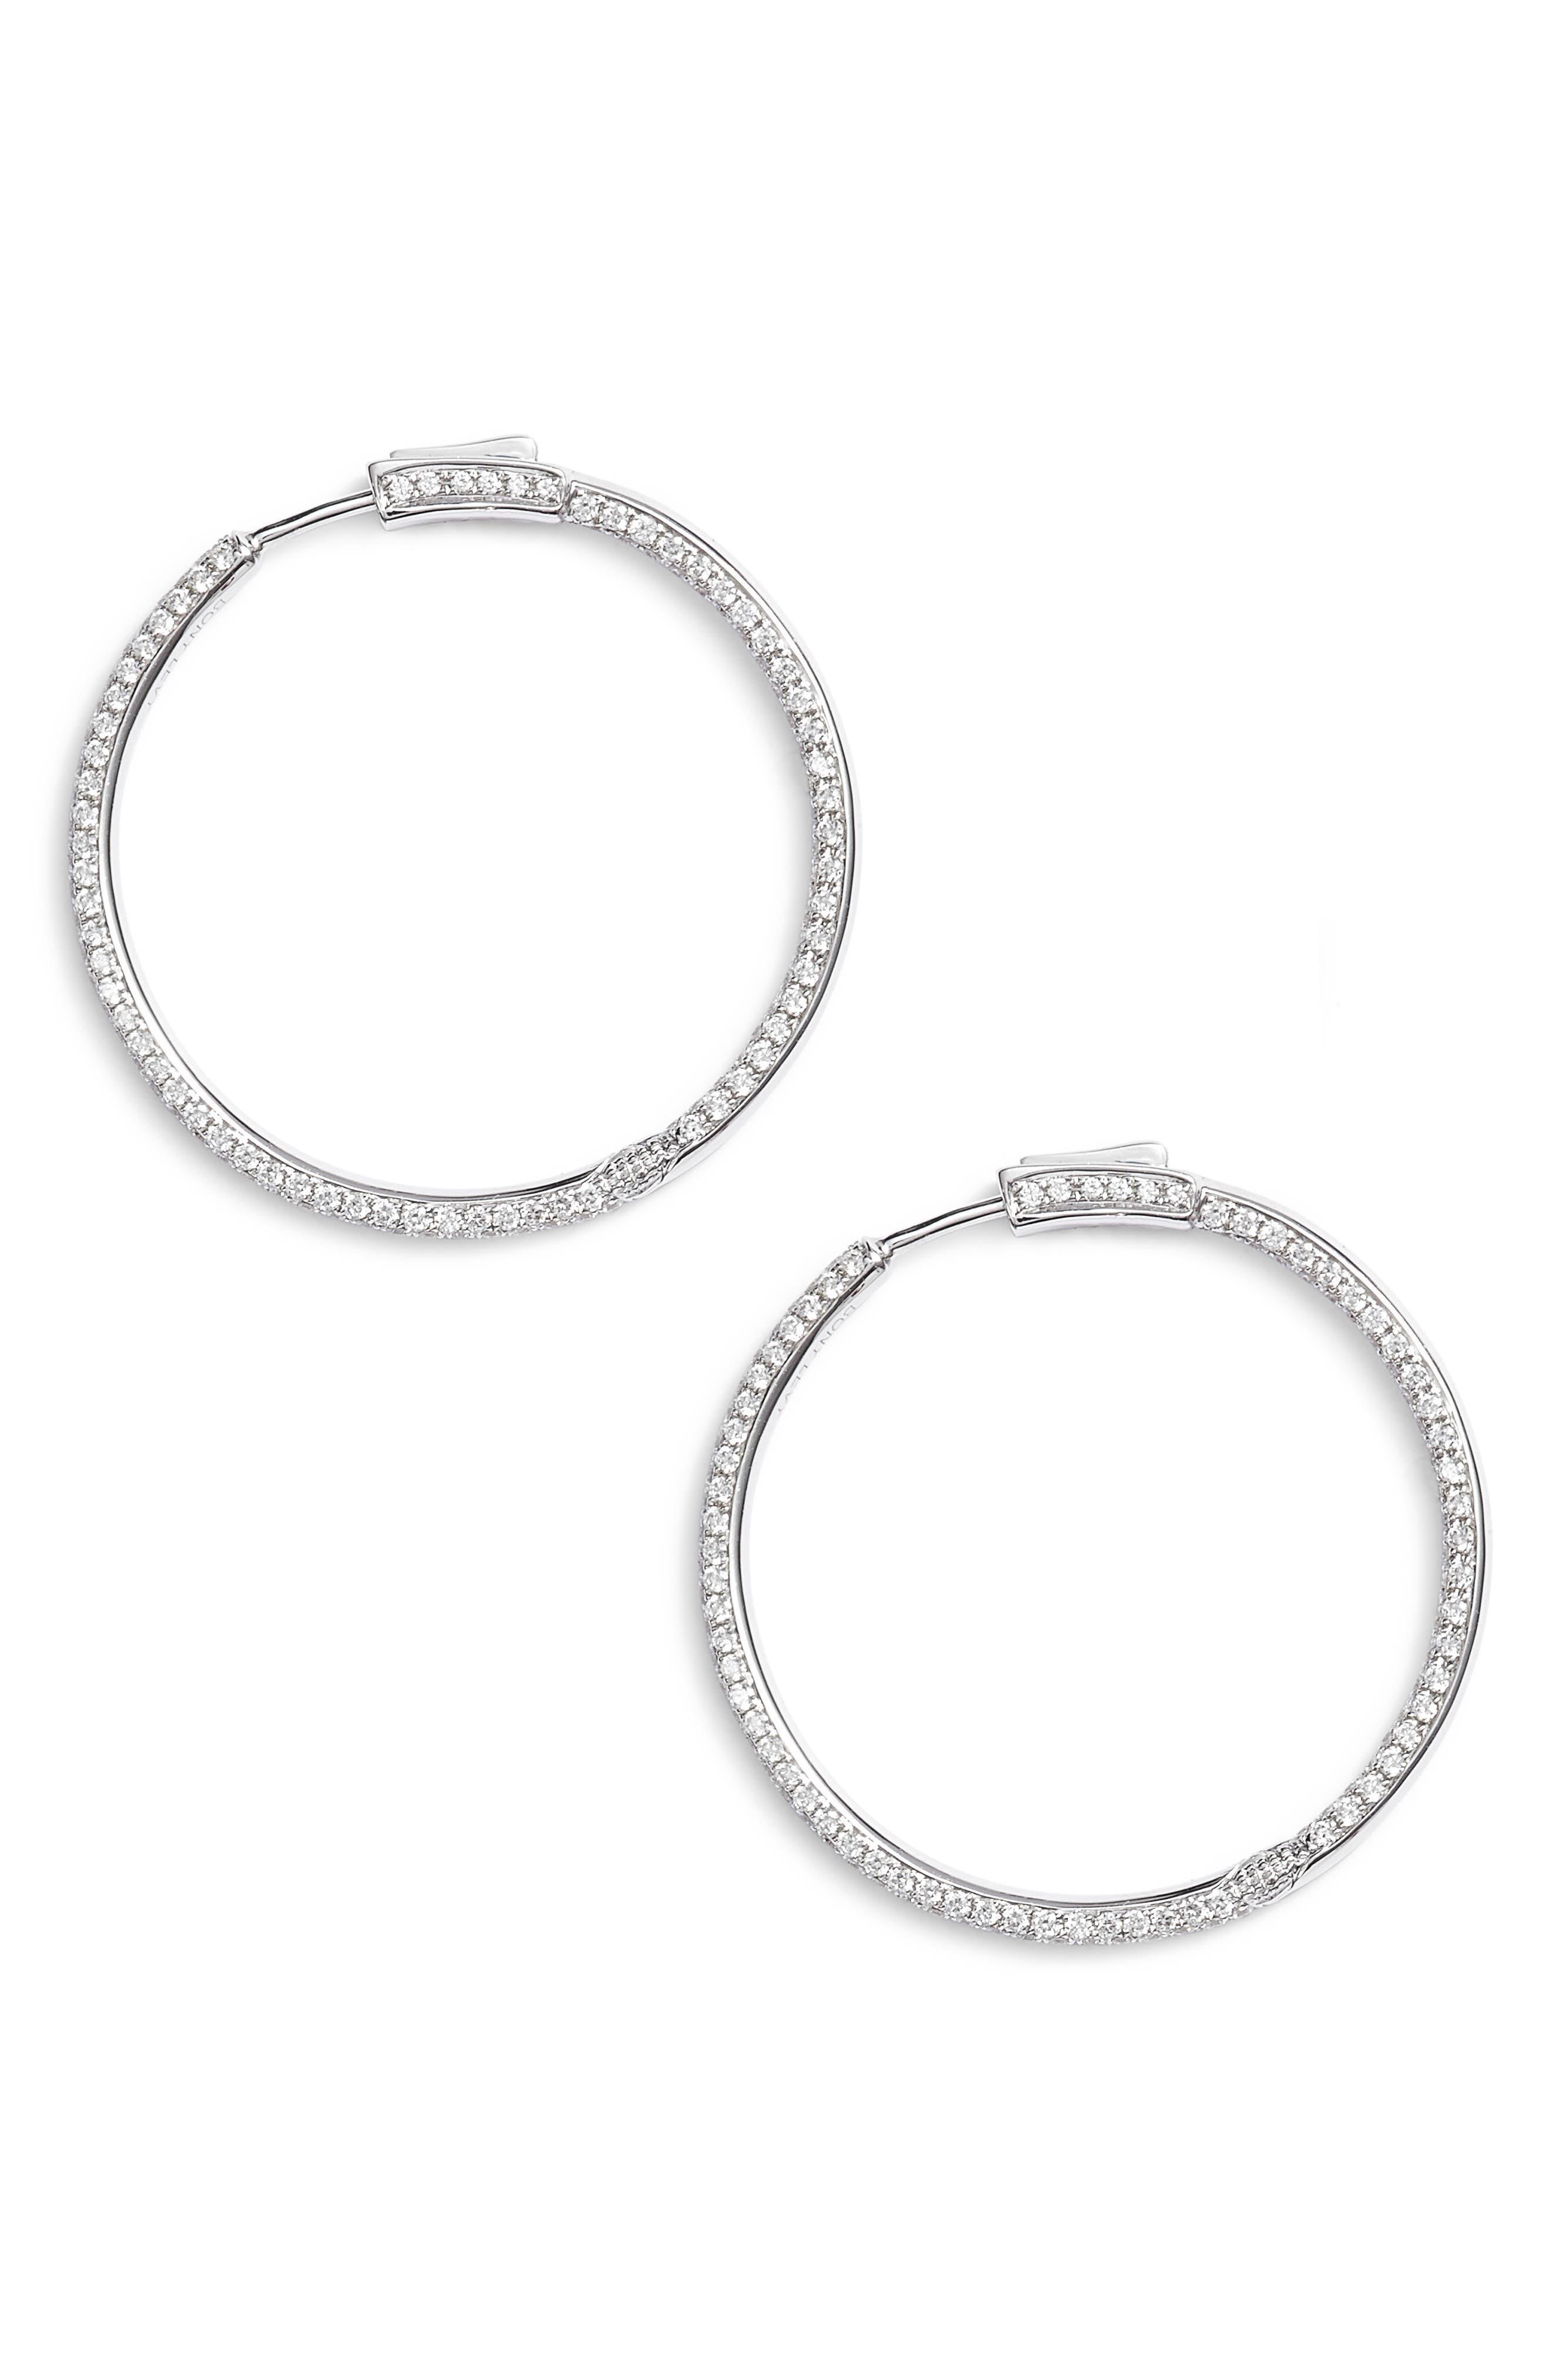 Inside Out Diamond Hoop Earrings,                             Main thumbnail 1, color,                             White Gold